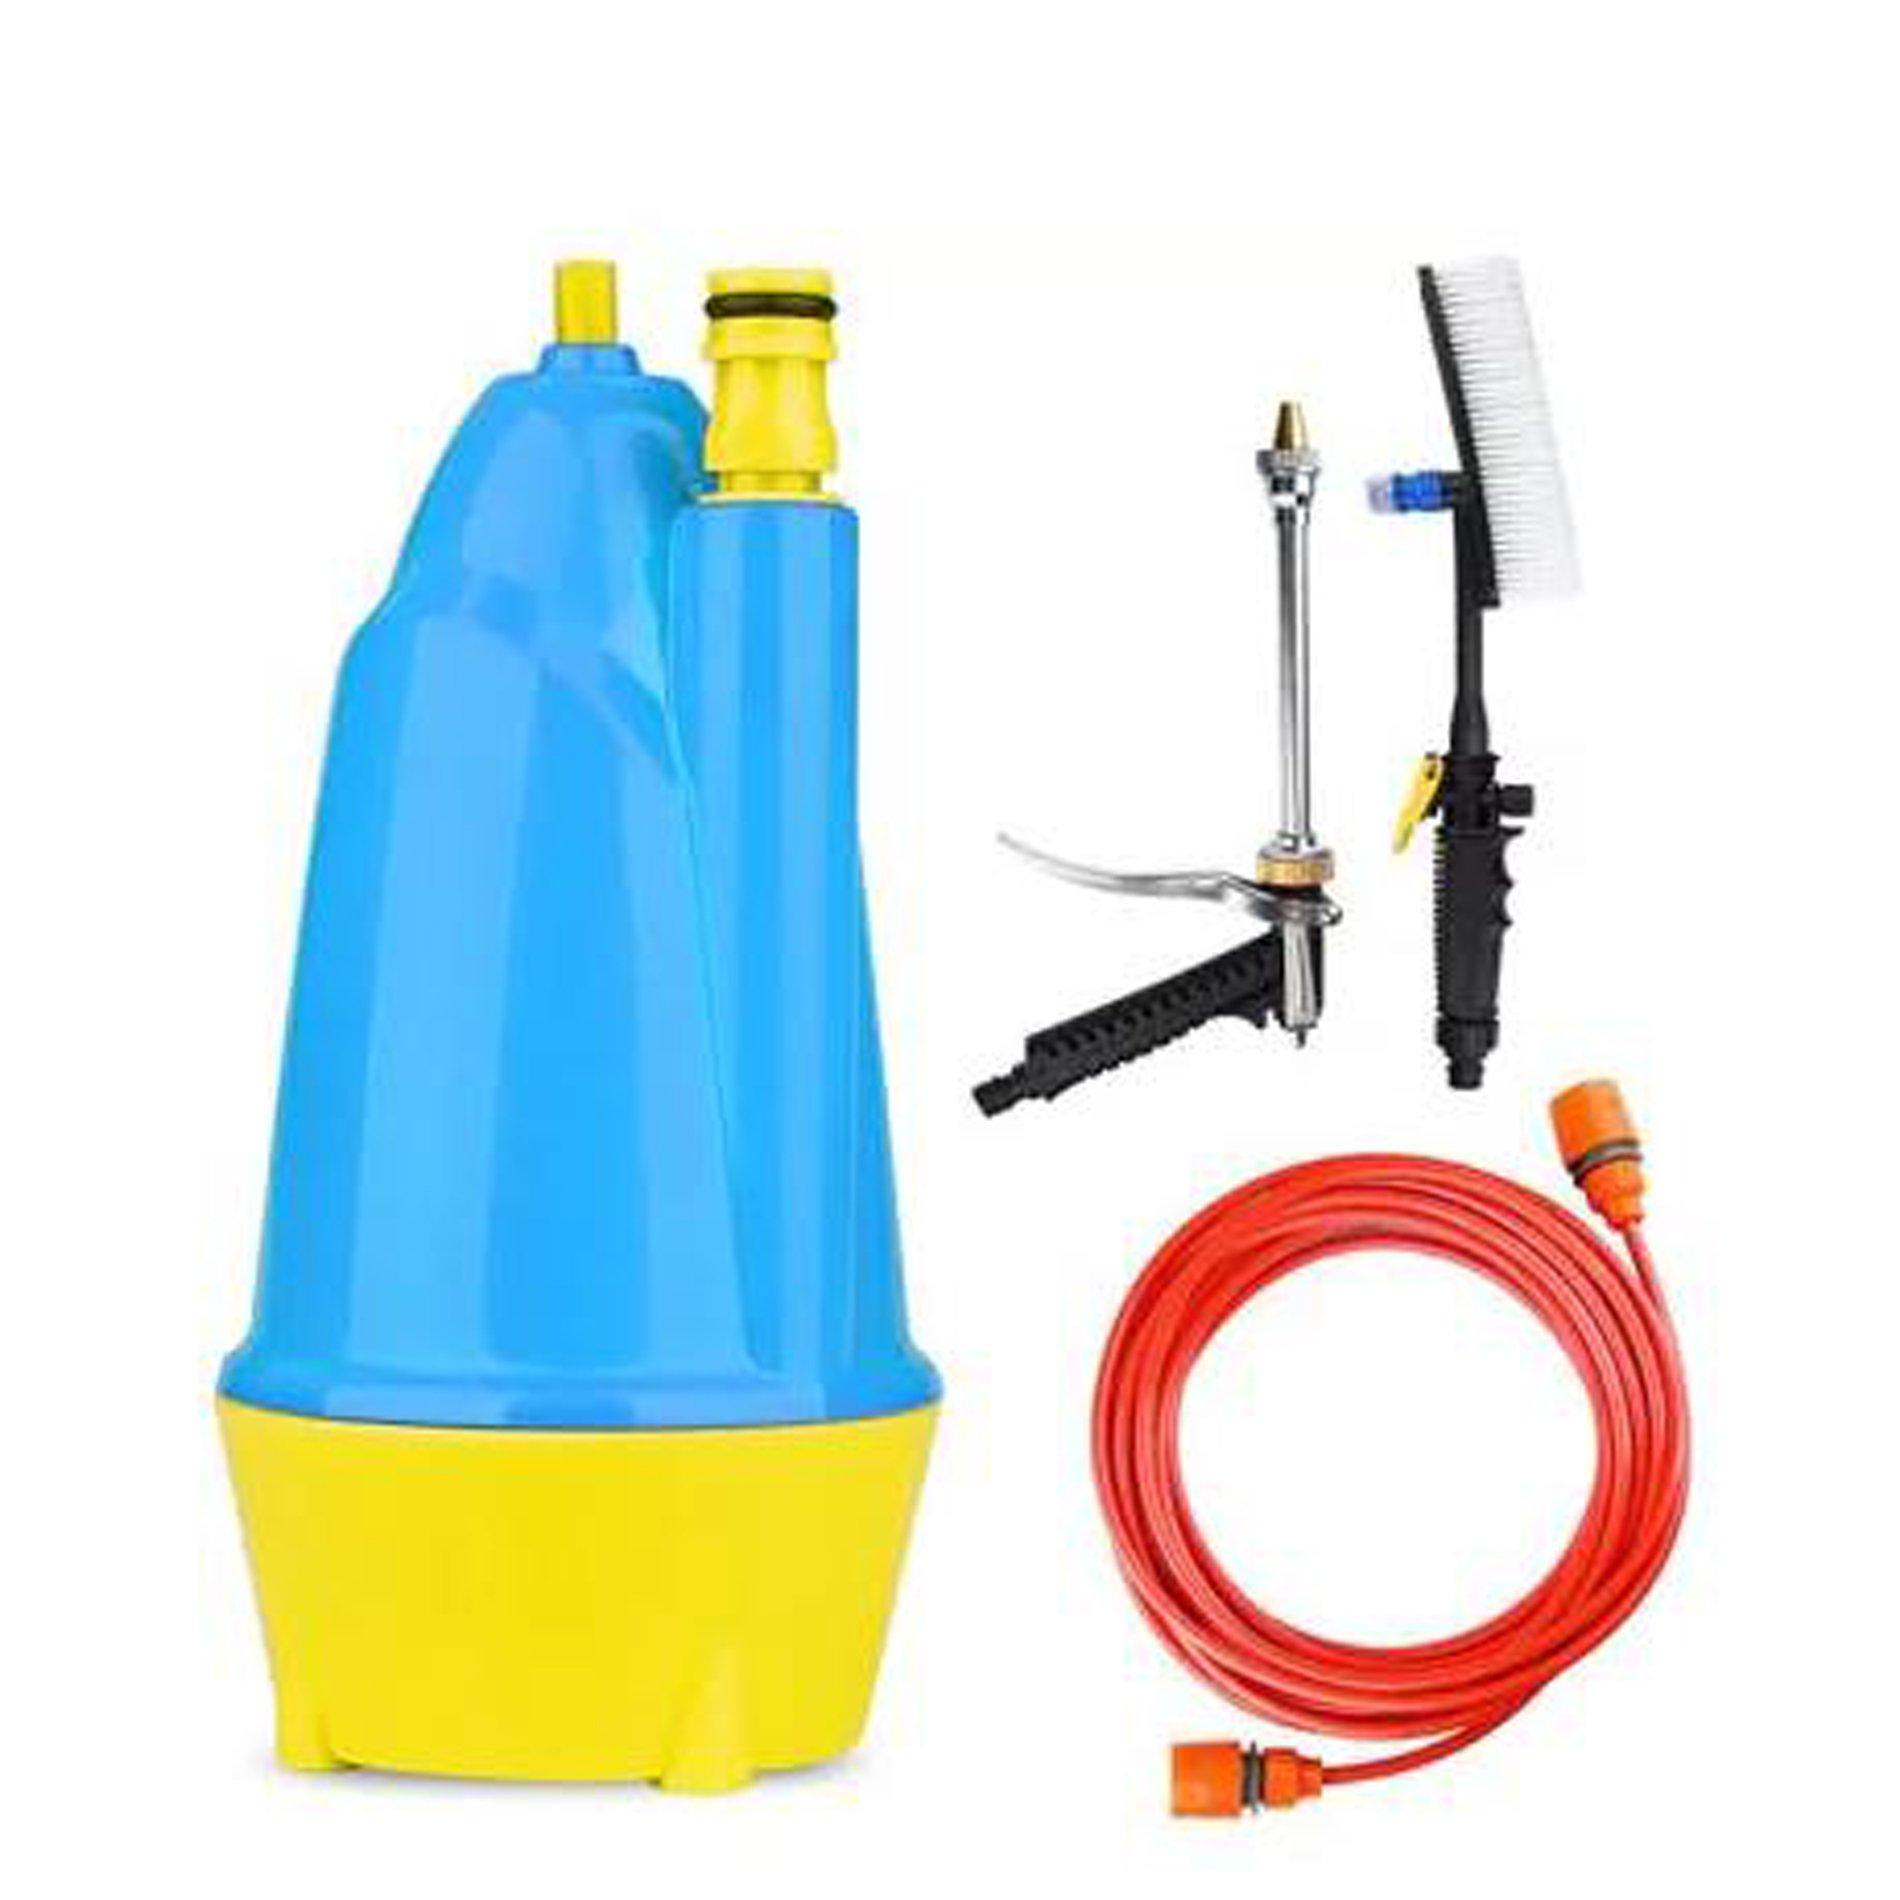 60W ABS Car Wash Pump - BLUE